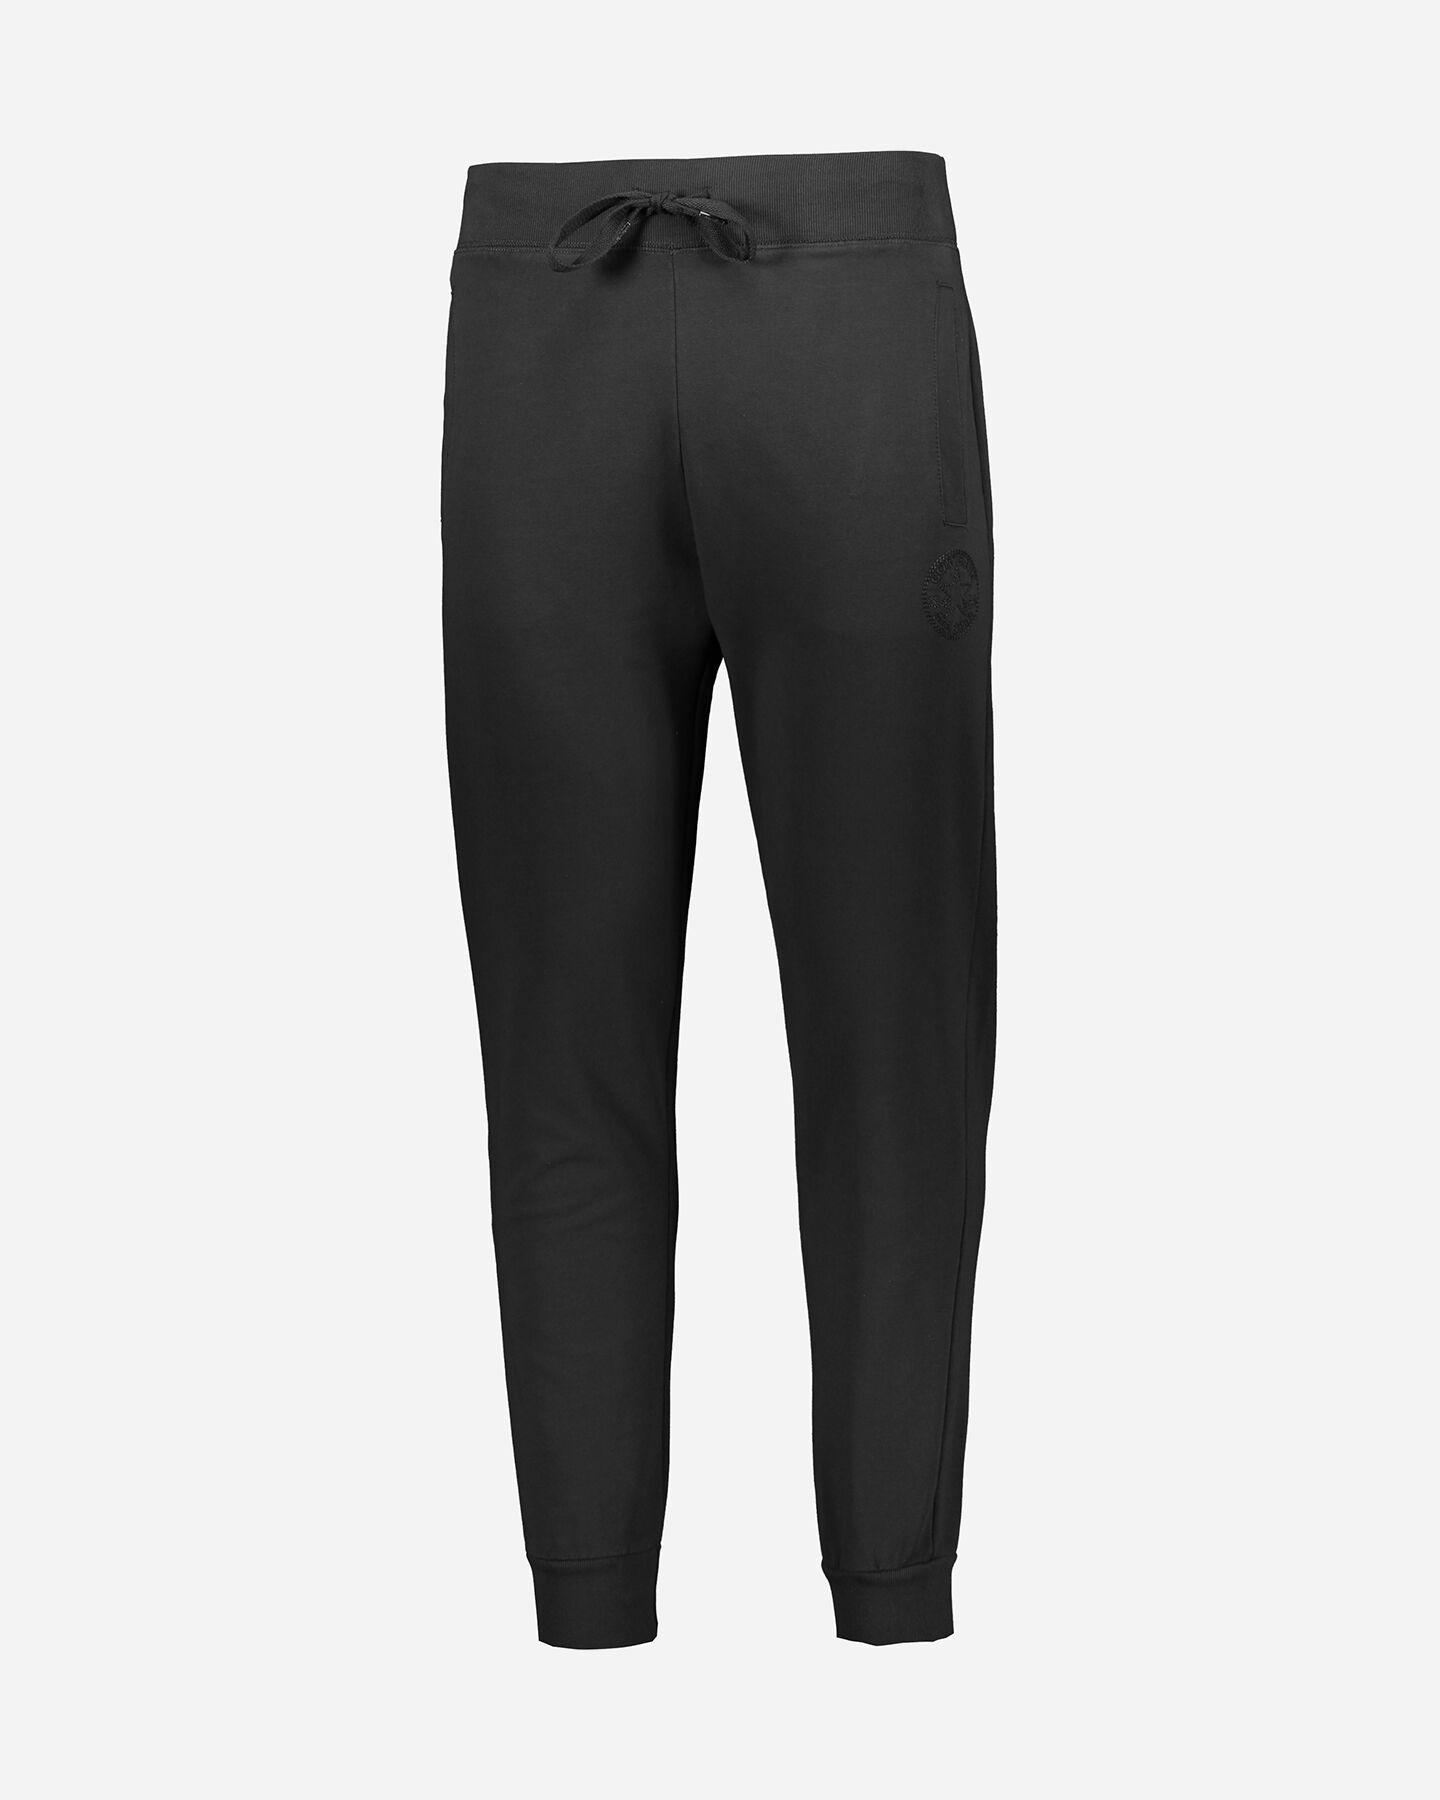 Pantalone CONVERSE CLASSIC PATCH M S5181084 scatto 0